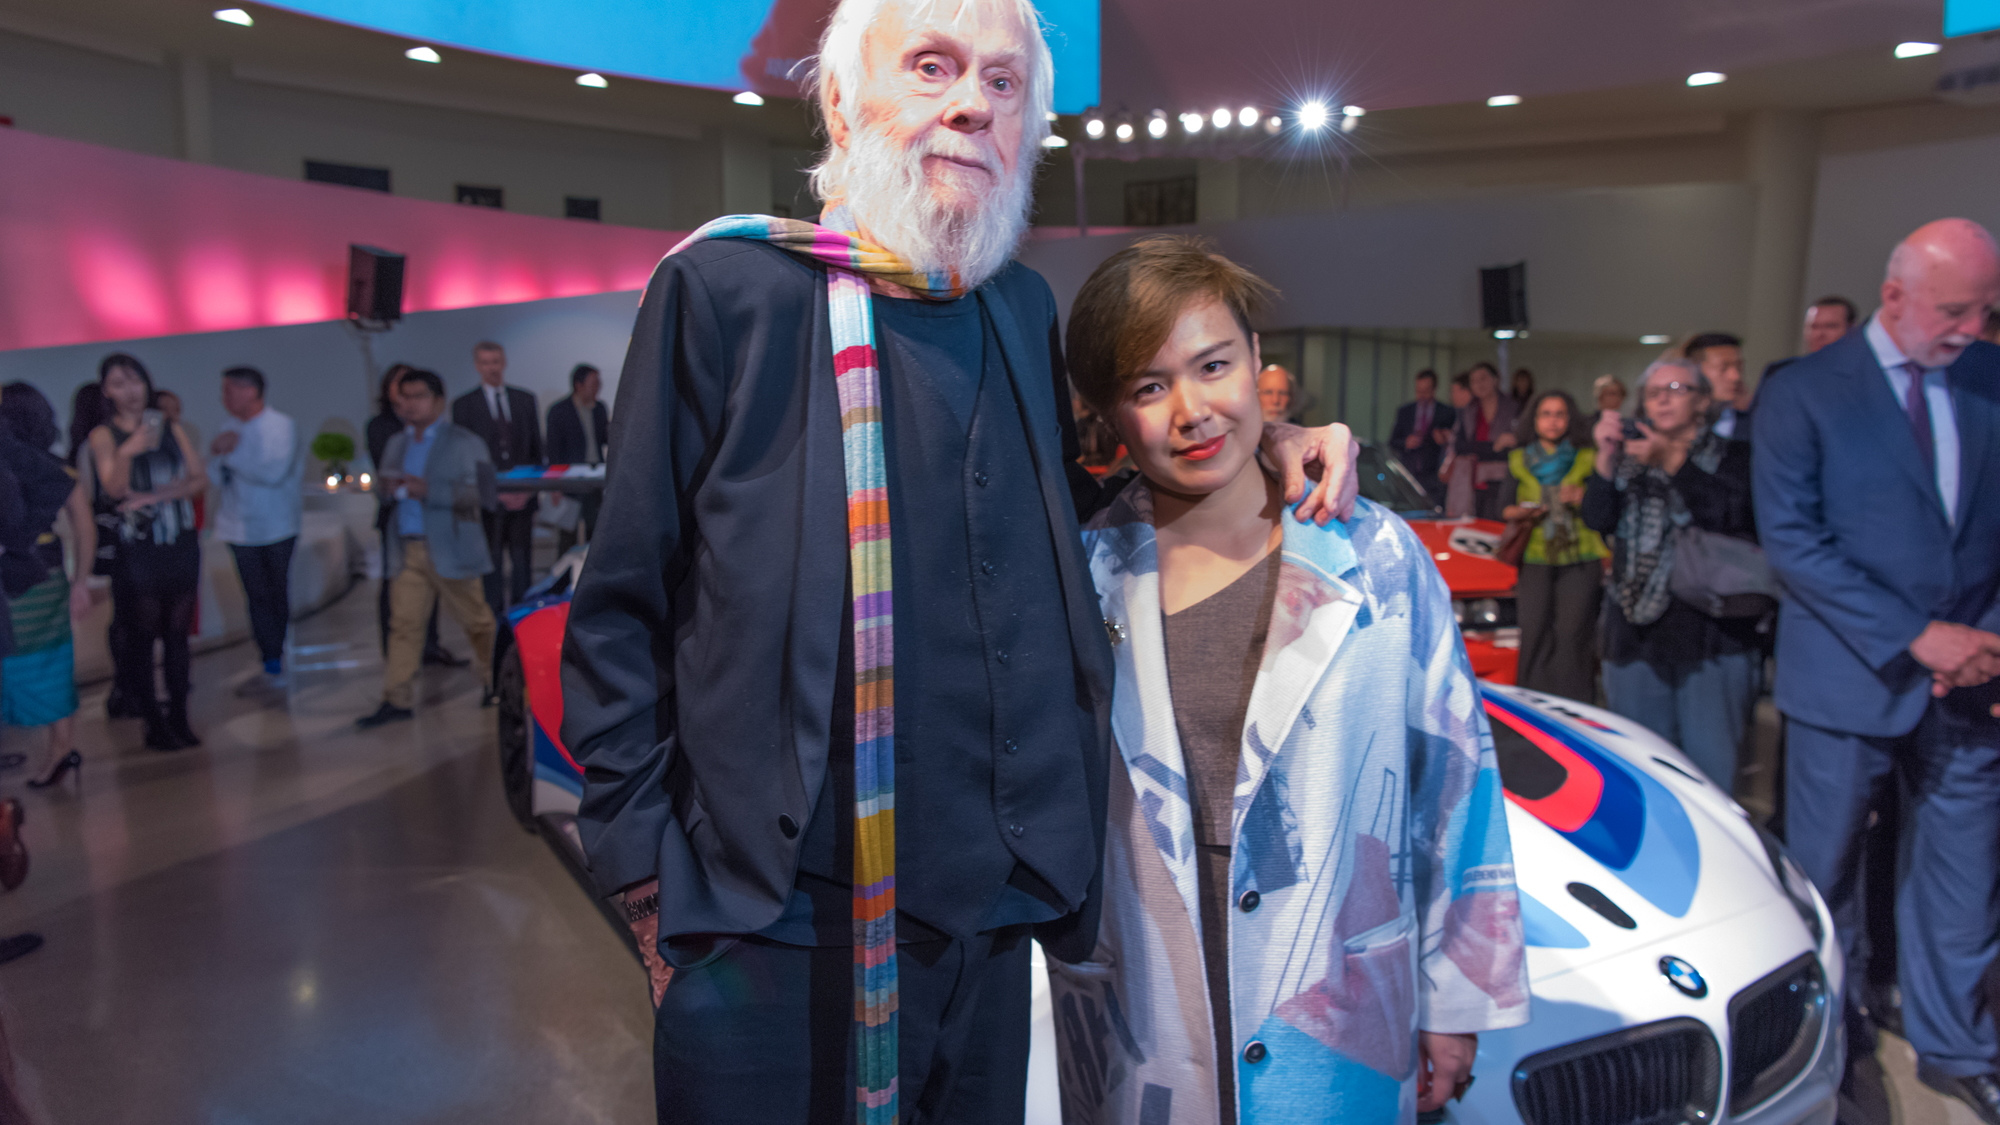 John Baldessari and Cao Fei, the new BMW Art Car artists